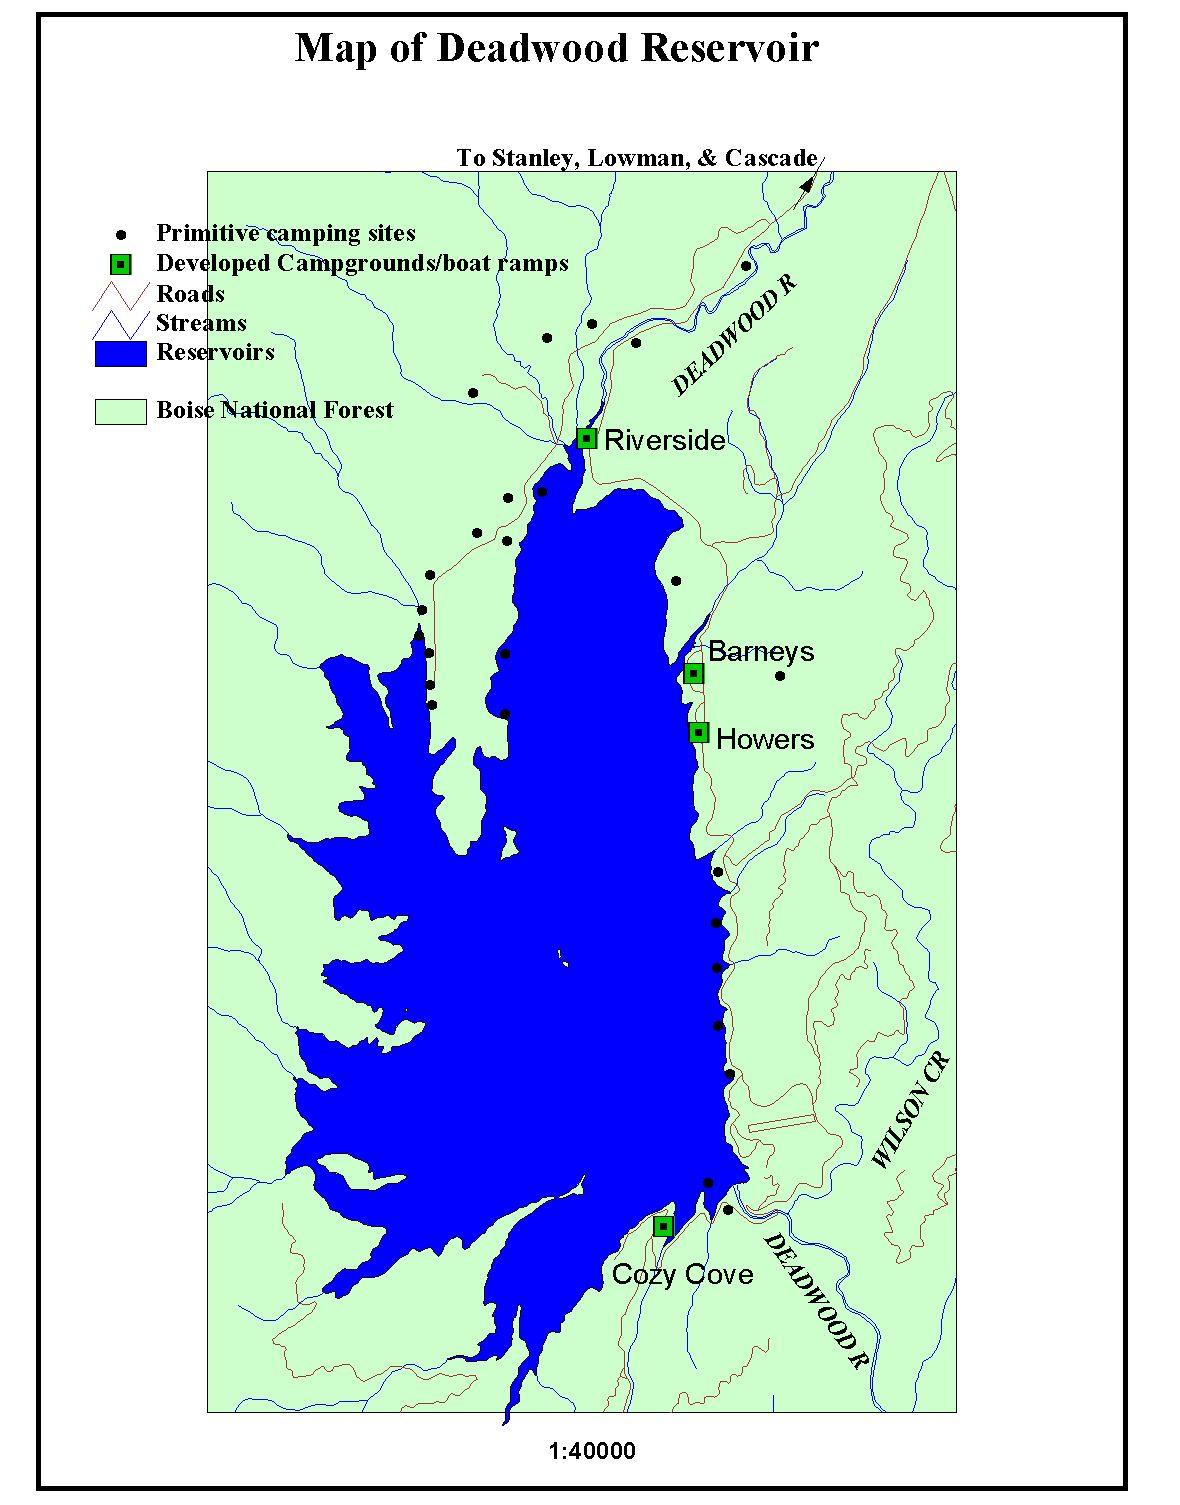 lowman reservoirlakes fishing map. boise national forest  learning center